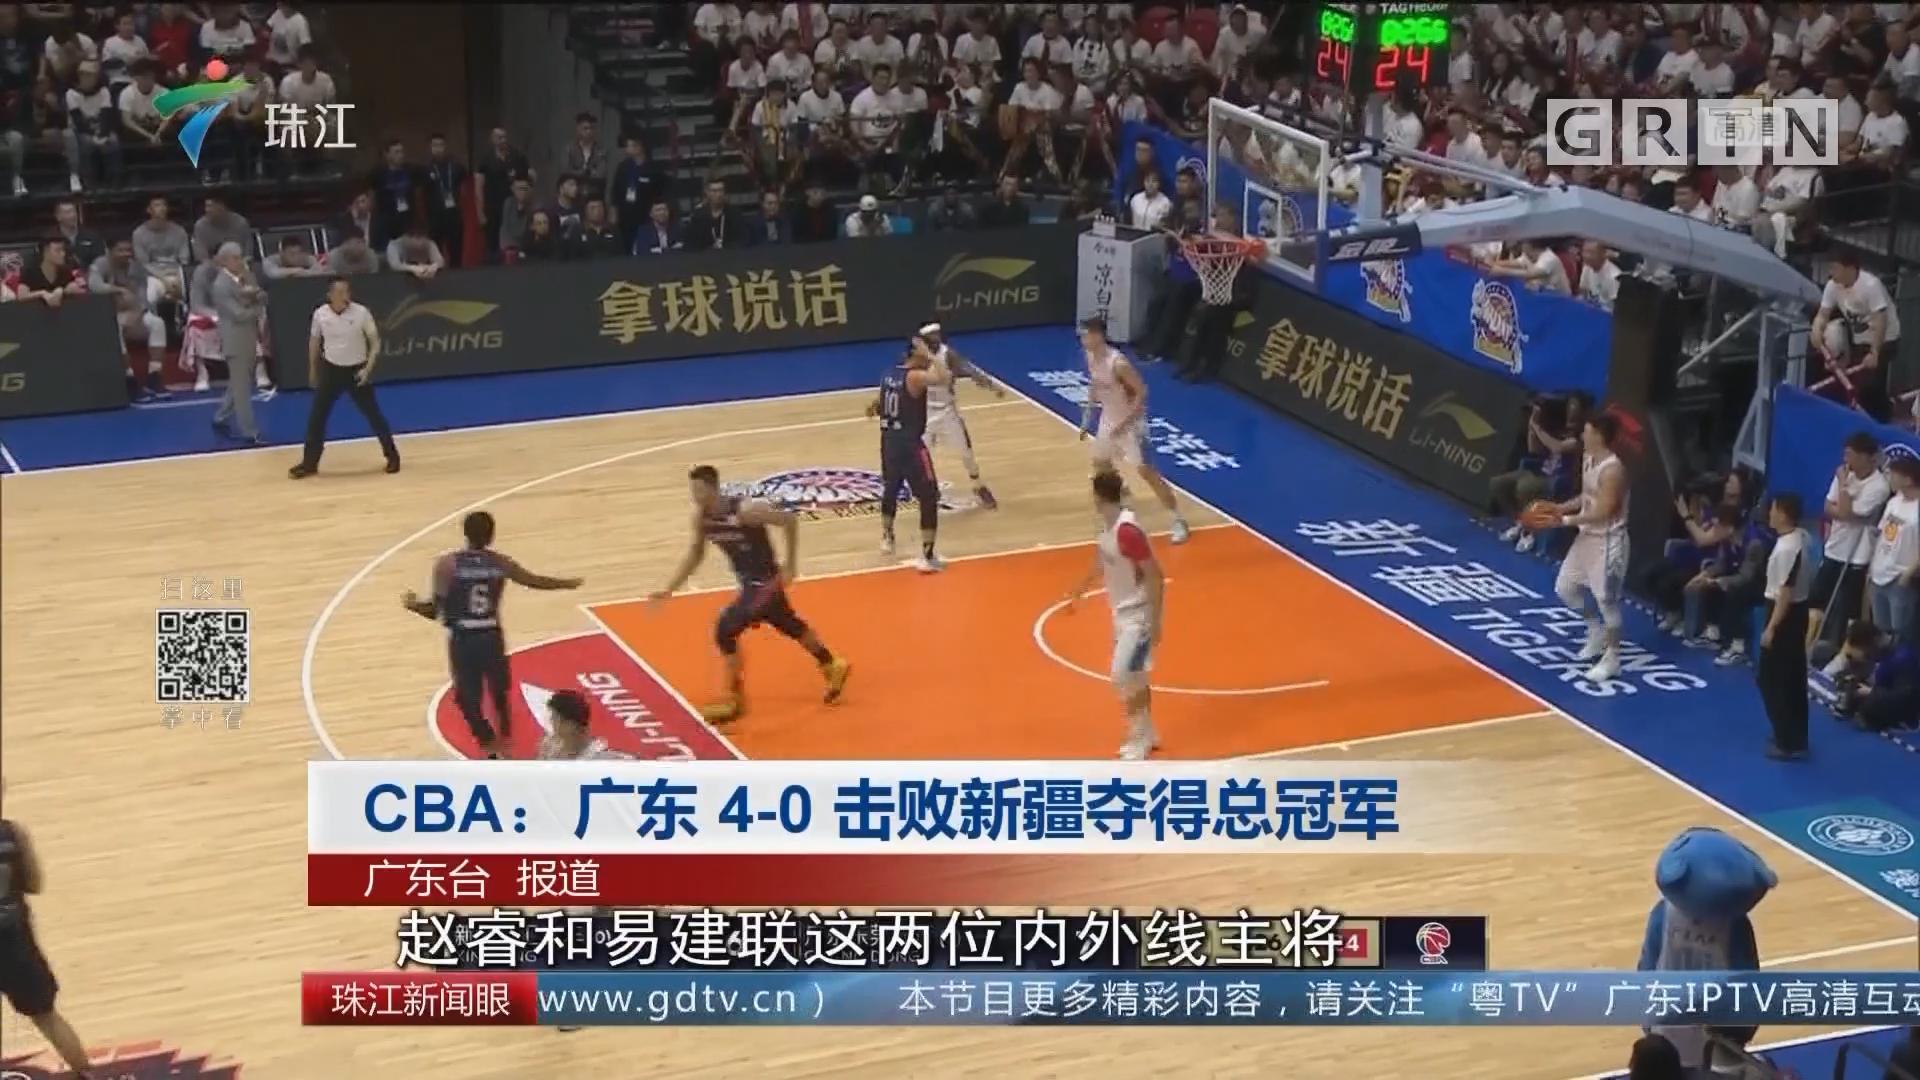 CBA:广东4-0击败新疆夺得总冠军